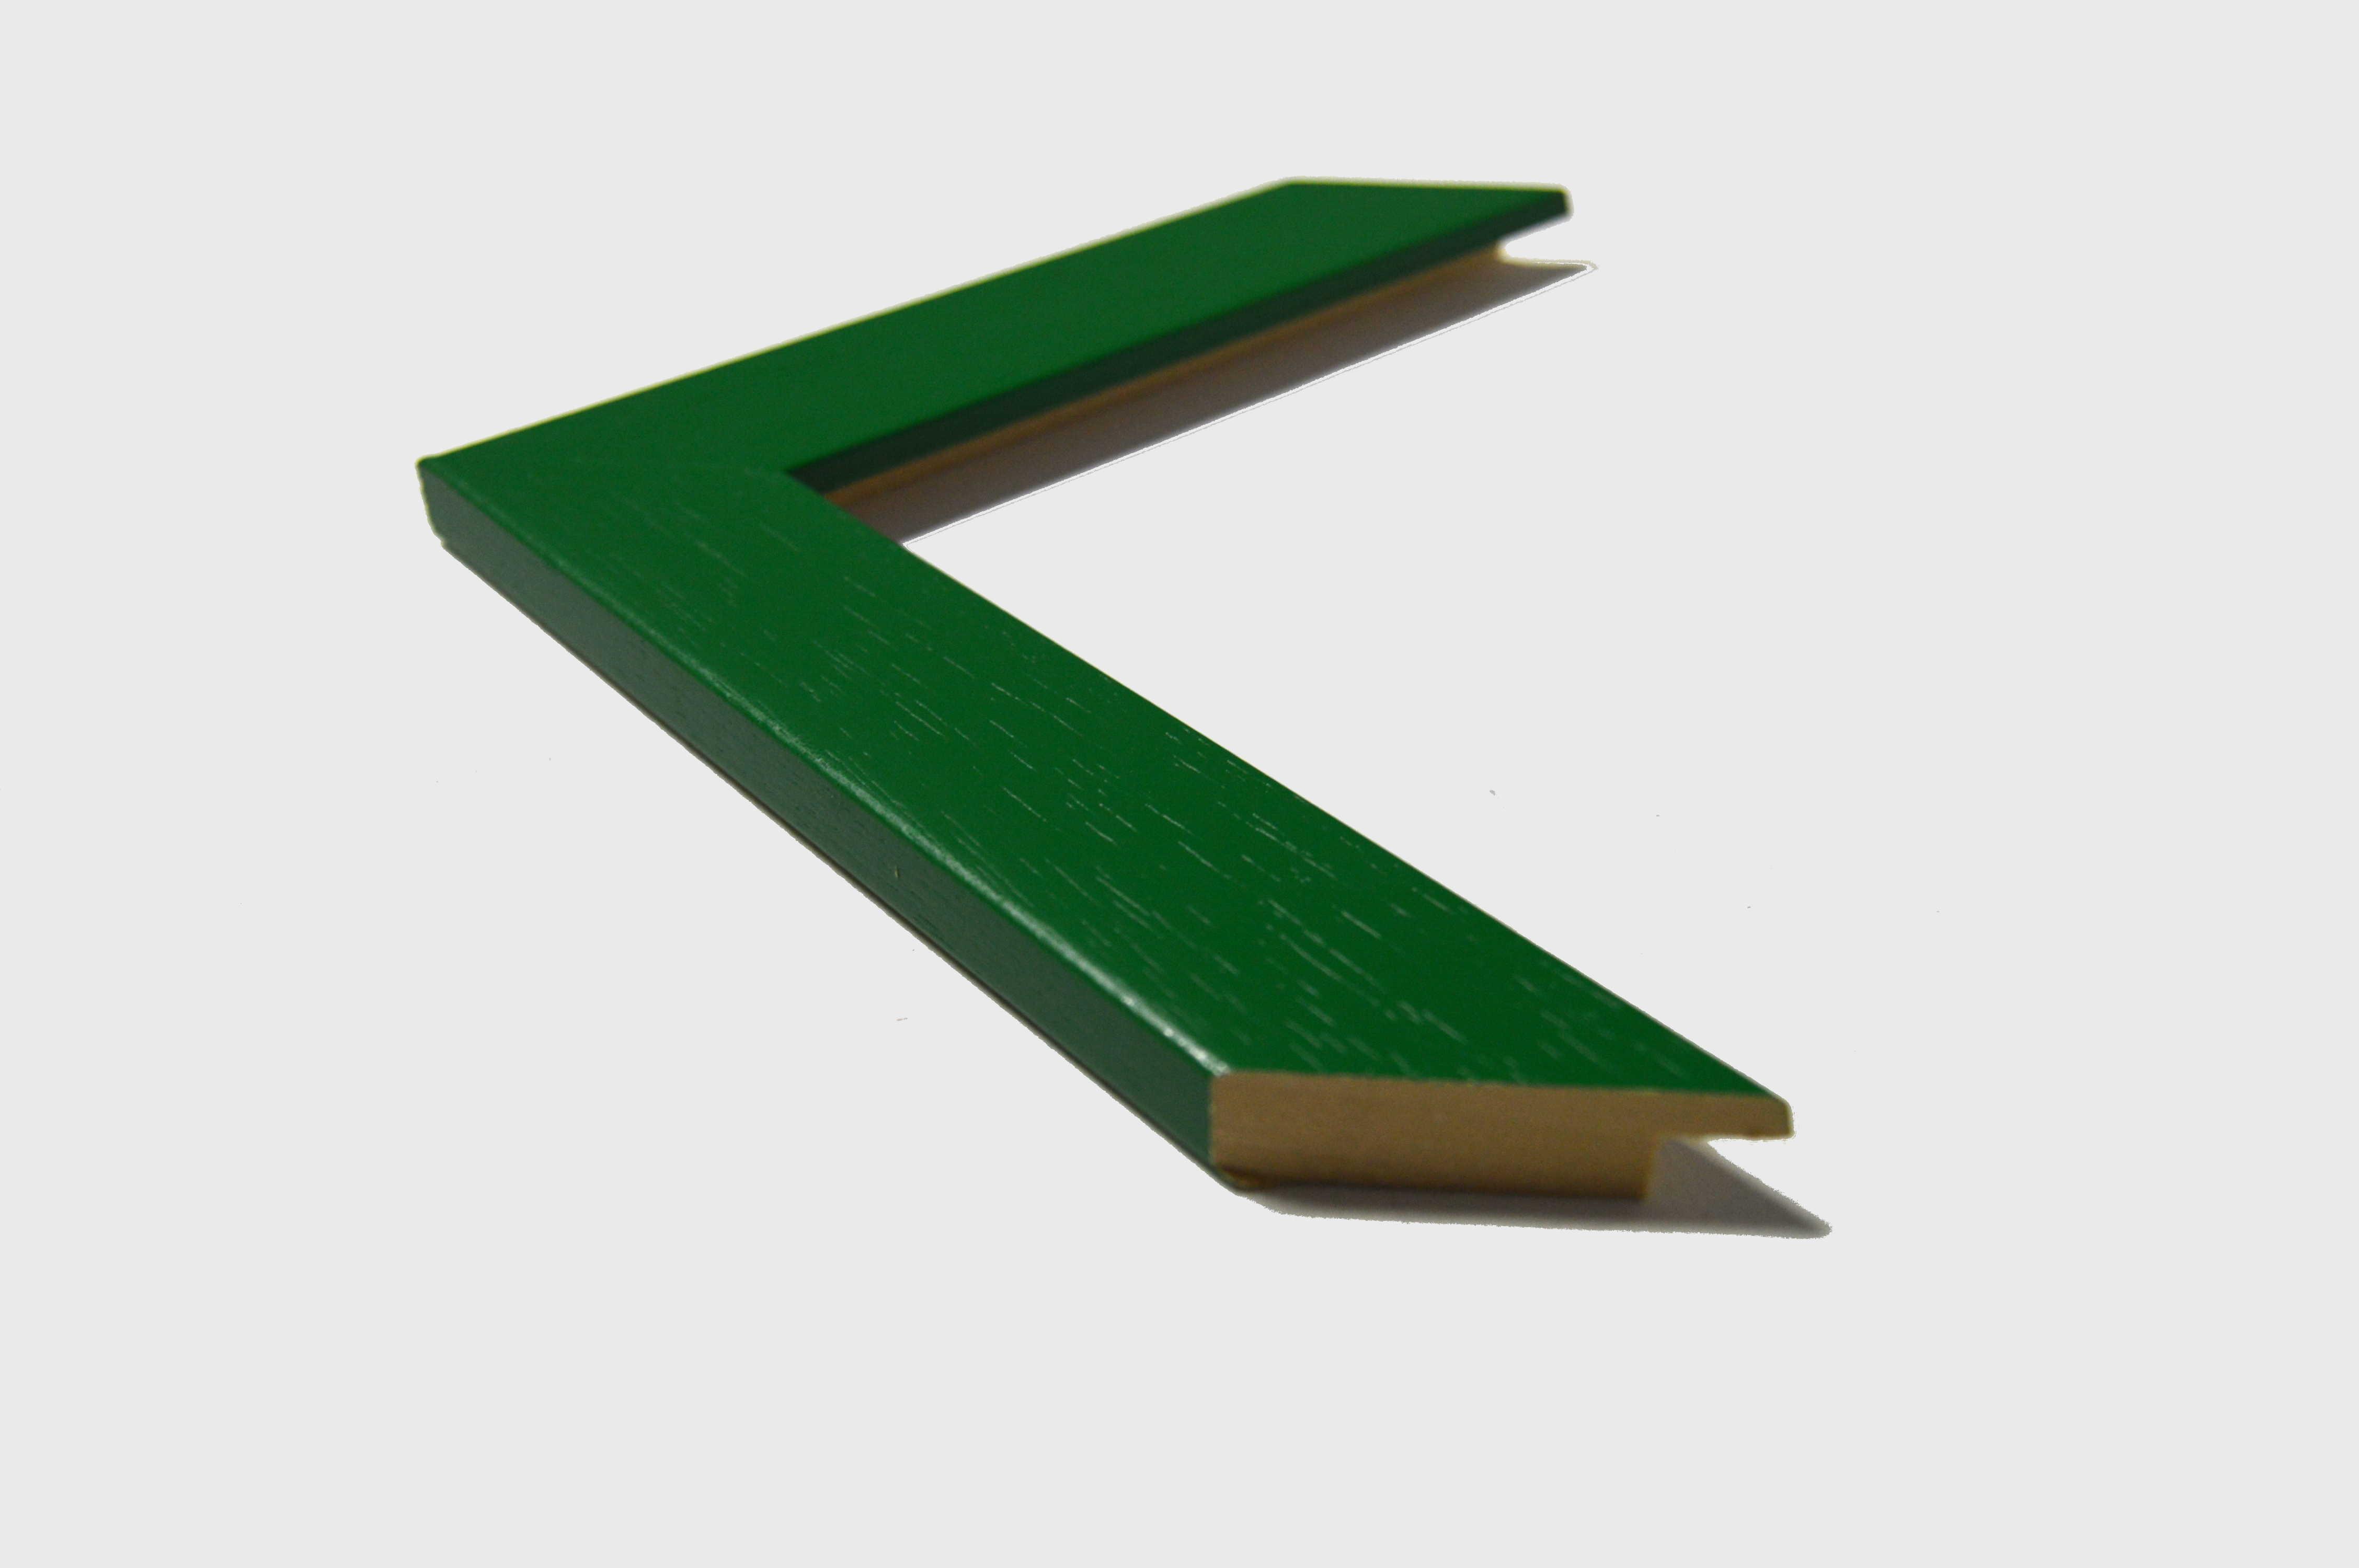 04011-VERDE-ancho3.4cm-perfil